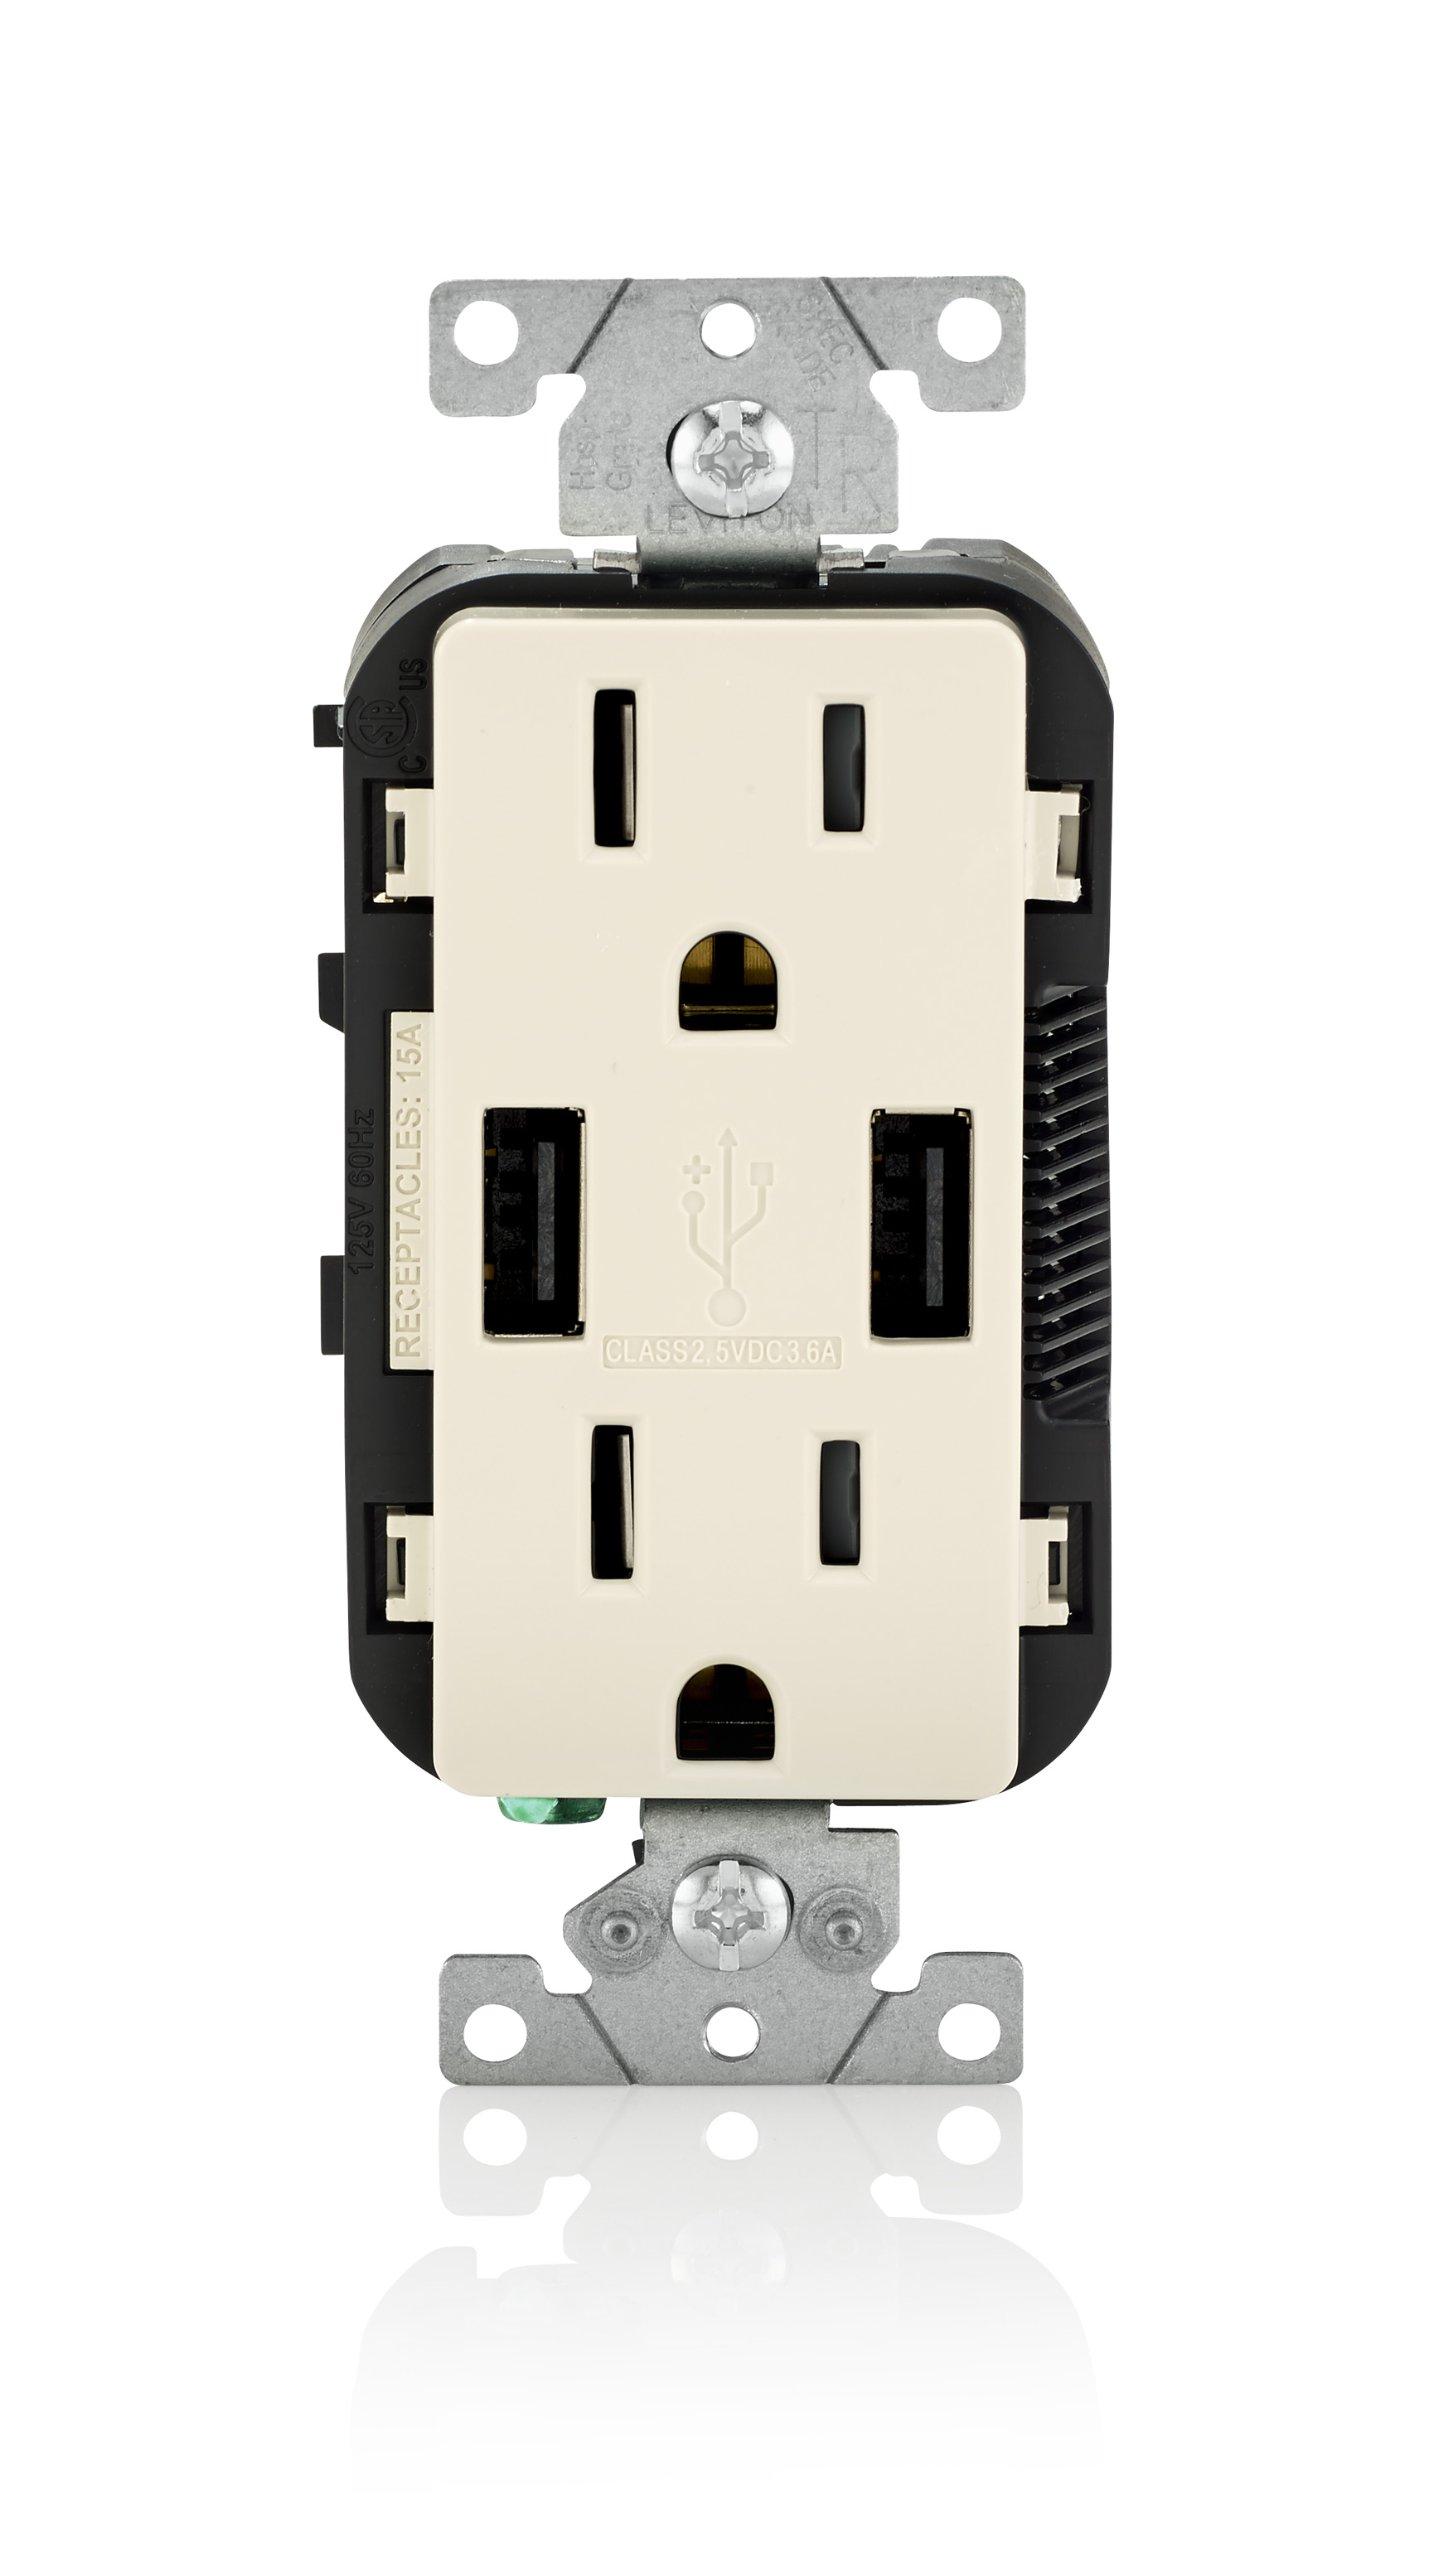 Leviton T5632-T USB Charger/Tamper-Resistant Duplex Receptacle, 15-Amp, 8-Pack, Light Almond